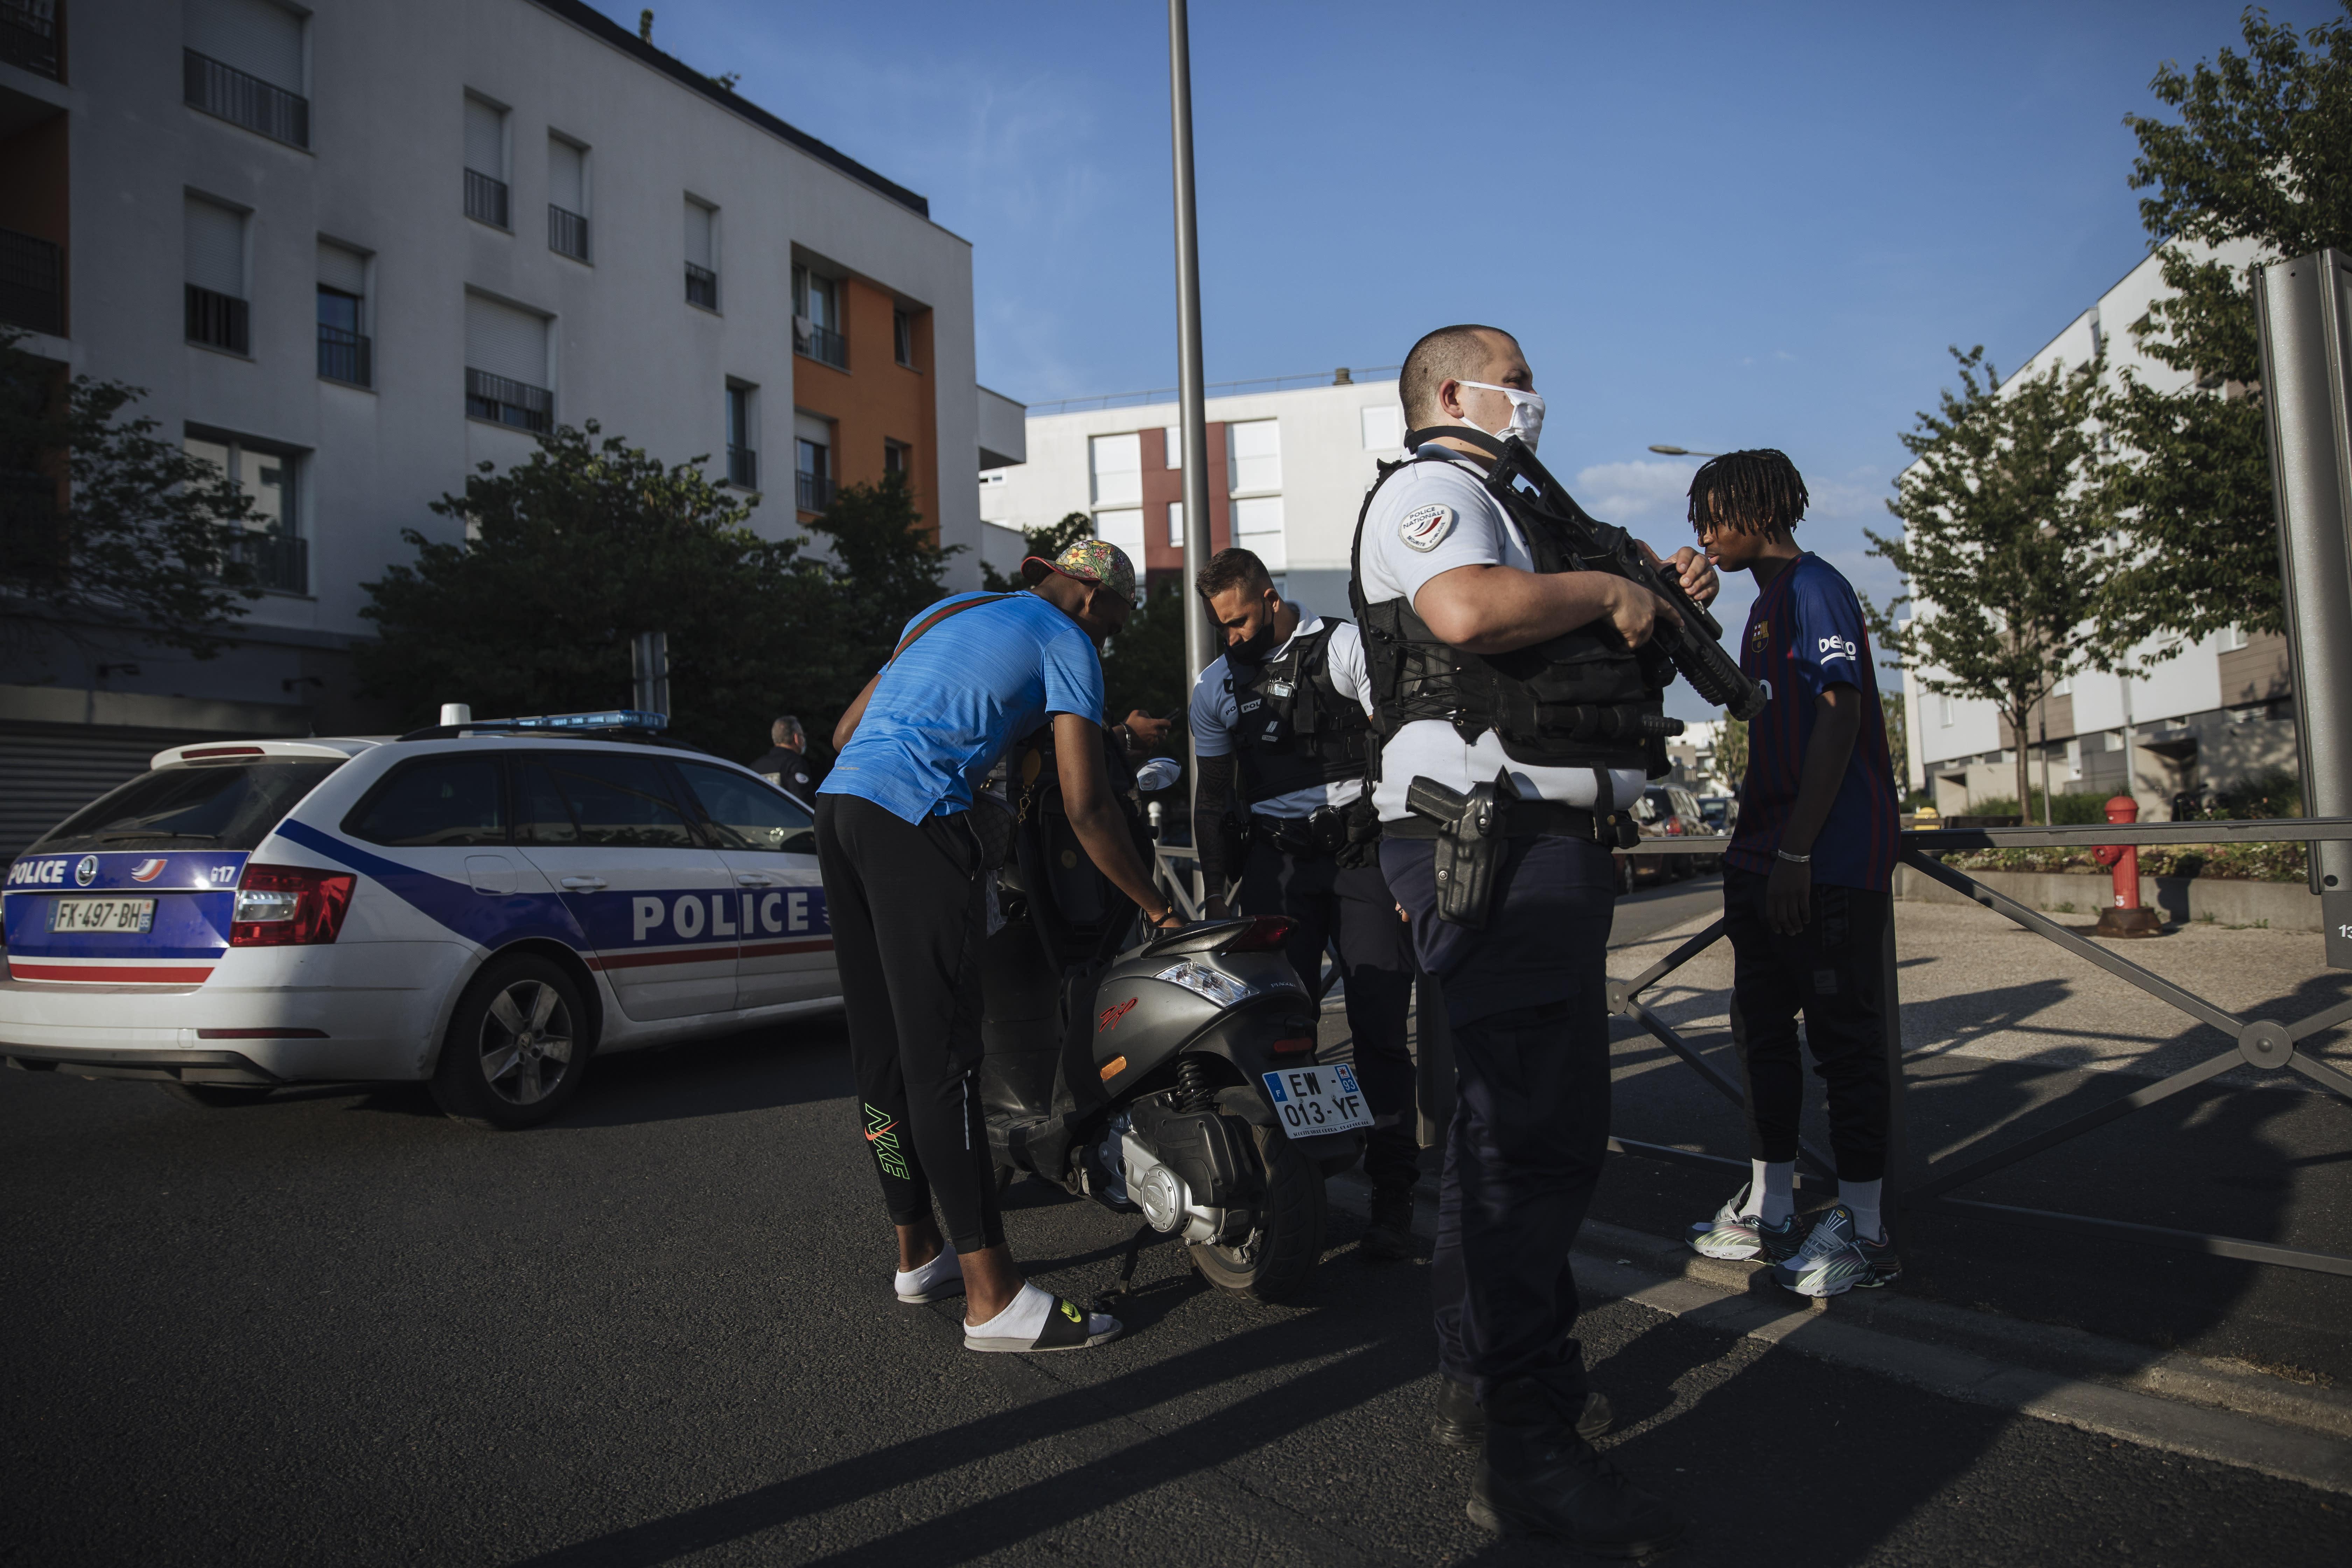 AP PHOTOS: On patrol with police in Paris' tough suburbs